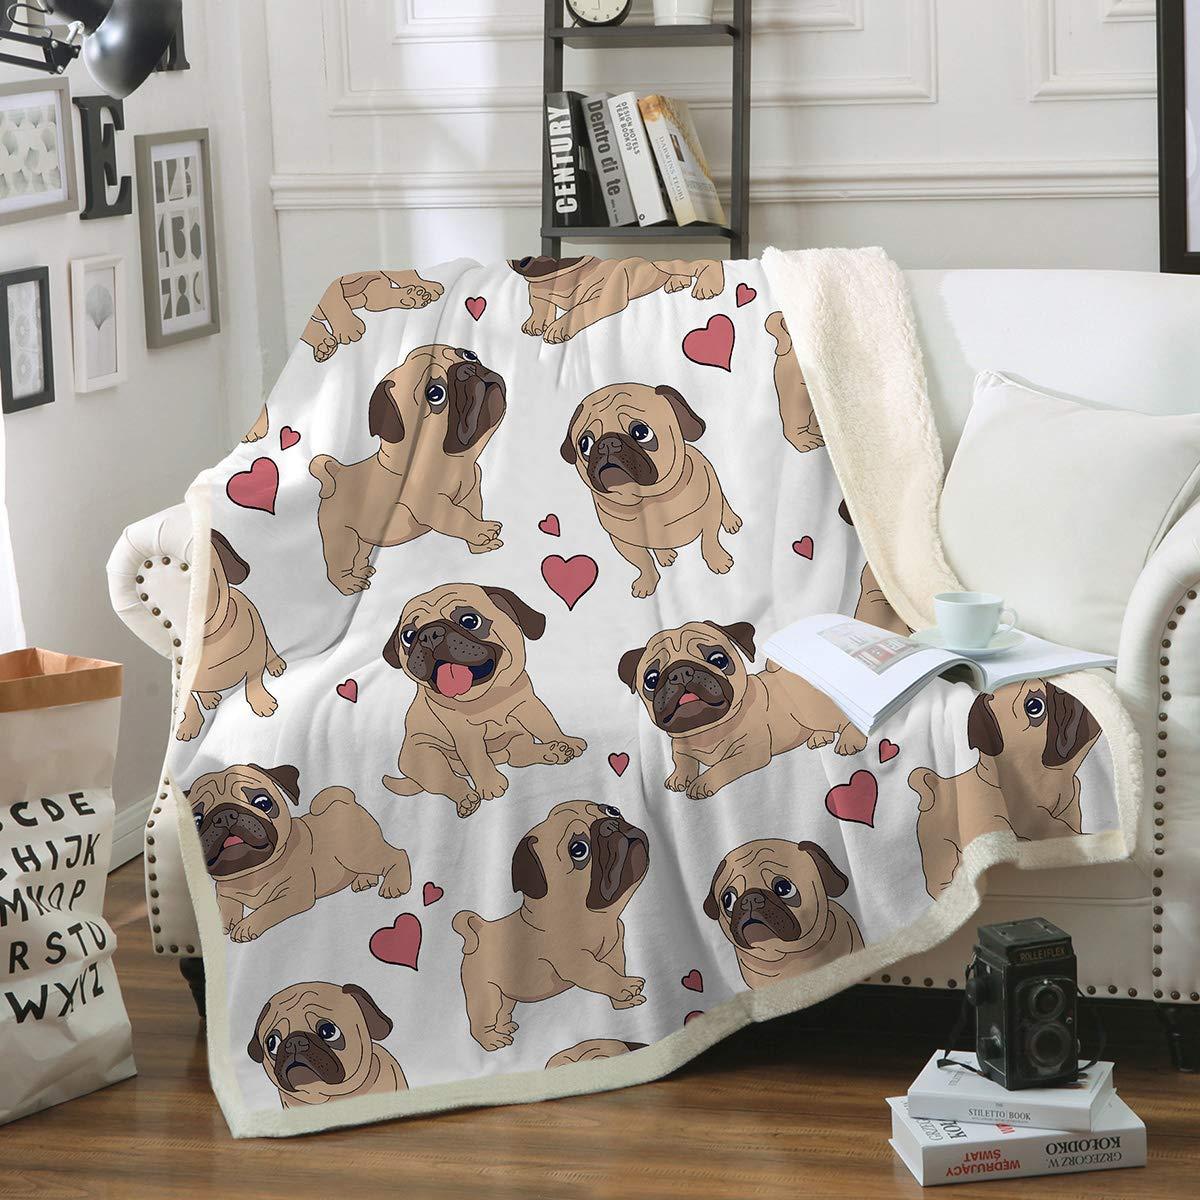 "Sleepwish Pug Fleece Blanket Pet Blanket Dog Reversible Blanket Soft Sherpa Blanket Throw Blanket Pug Lover (50""x 60"")"